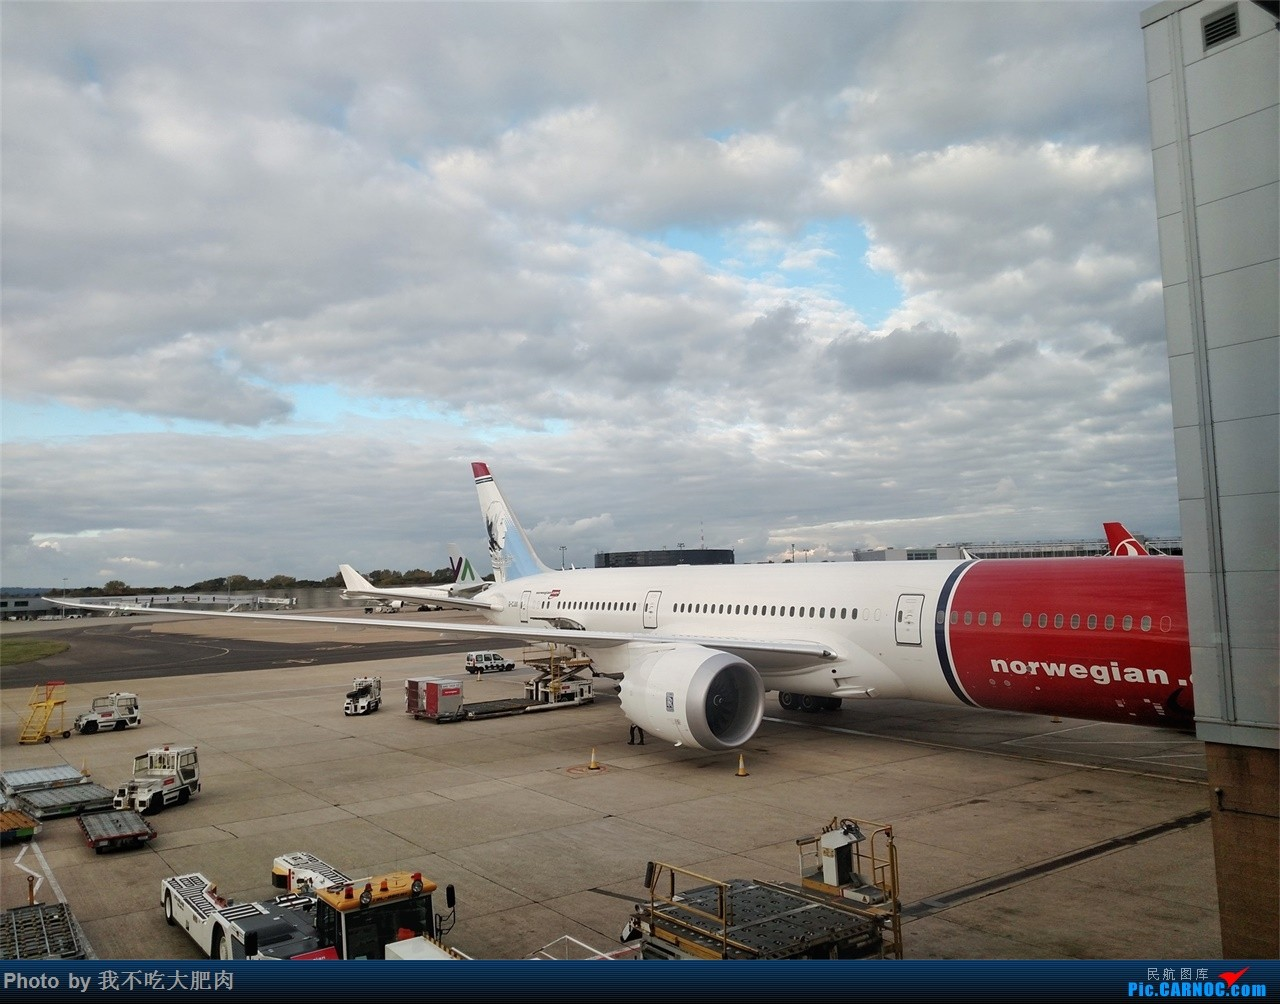 Re:挪威航空 Norwegian Airlines 纽约伦敦 787-9伪首发 BOEING 787-9 G-CJUI LGW